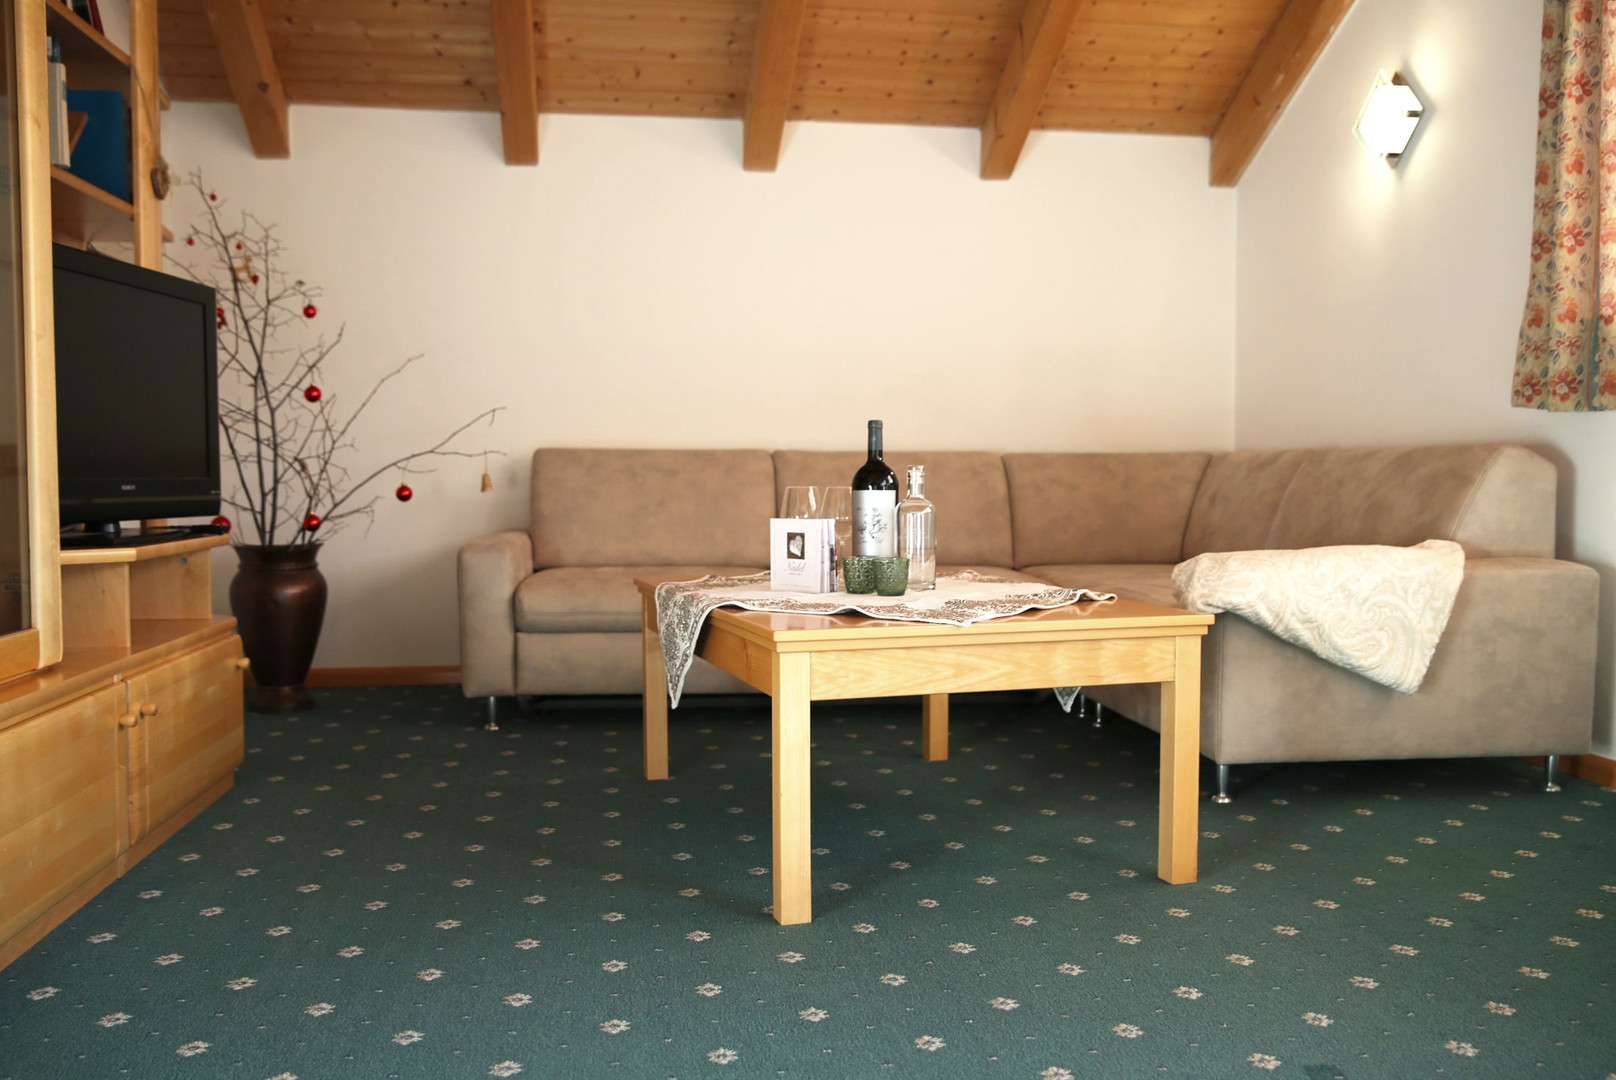 Apartments_Lara_Gro%CC%88den_Wohnung_1-6